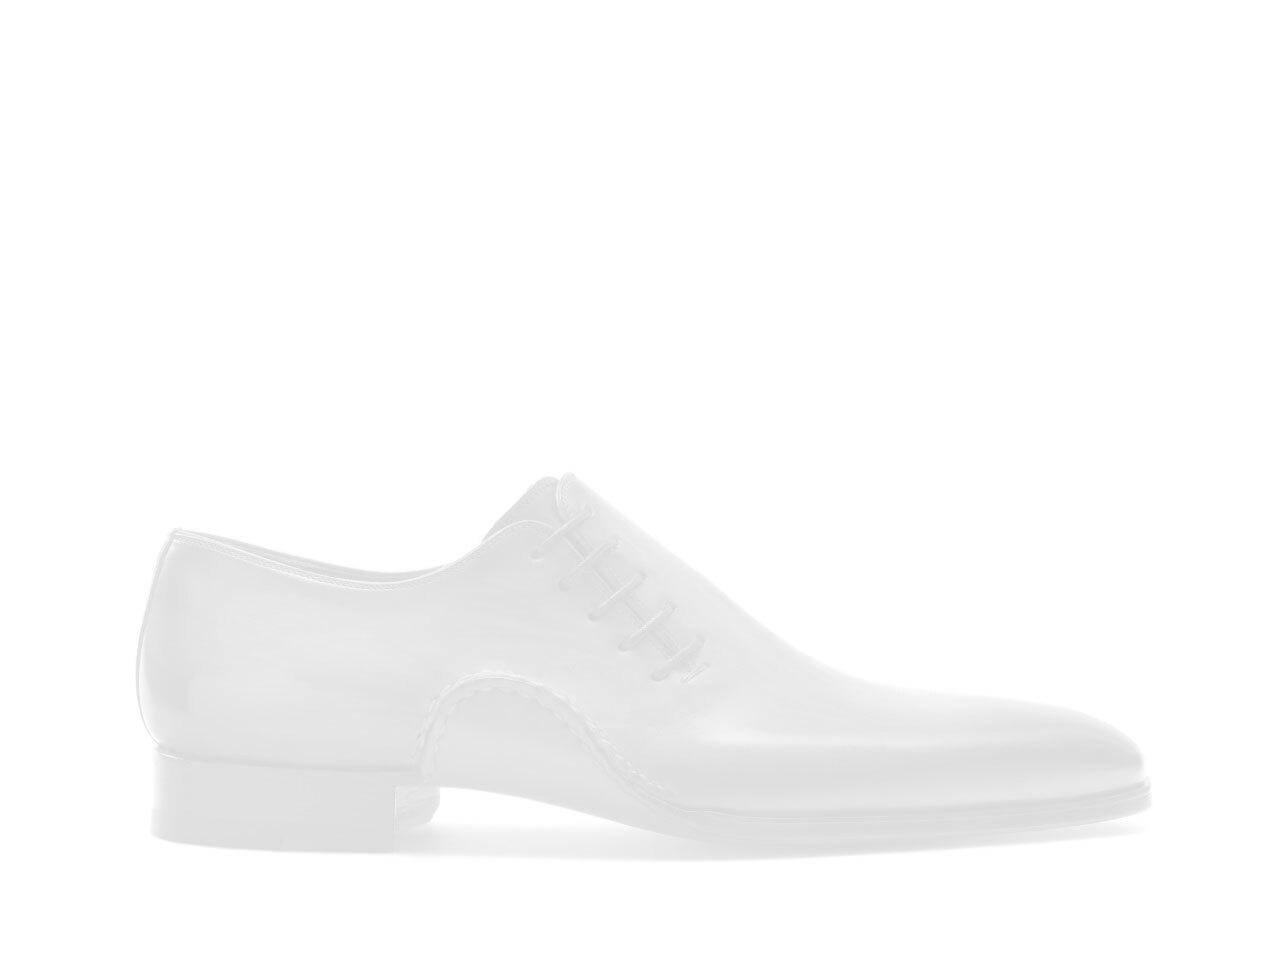 Sole of the Magnanni Marco Black Men's Single Monk Strap Shoes